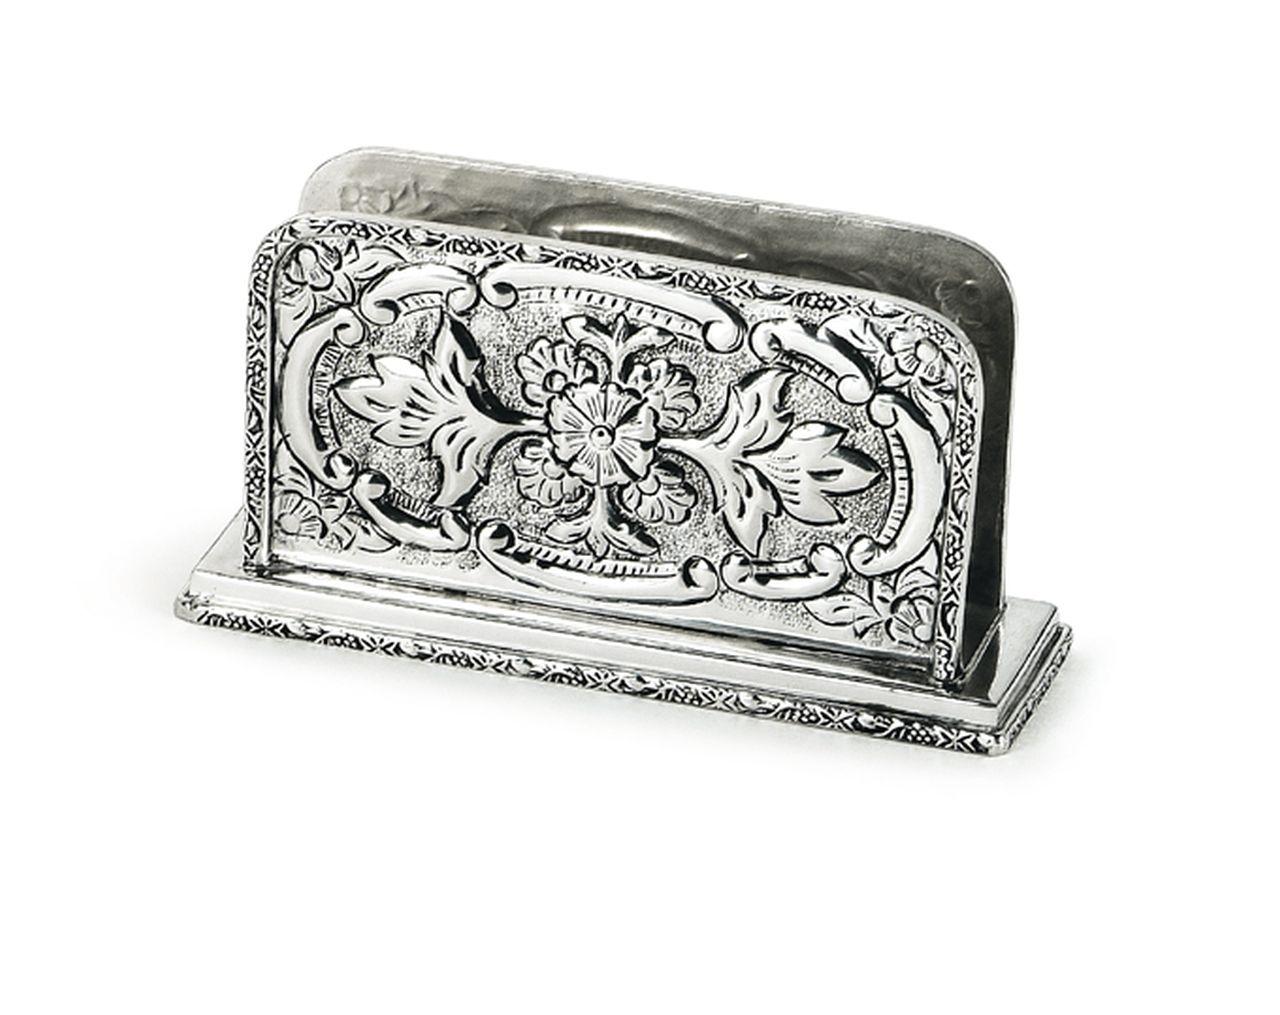 Portalettere argentato argento sheffield stile cesellato cm.16x4,5x10h